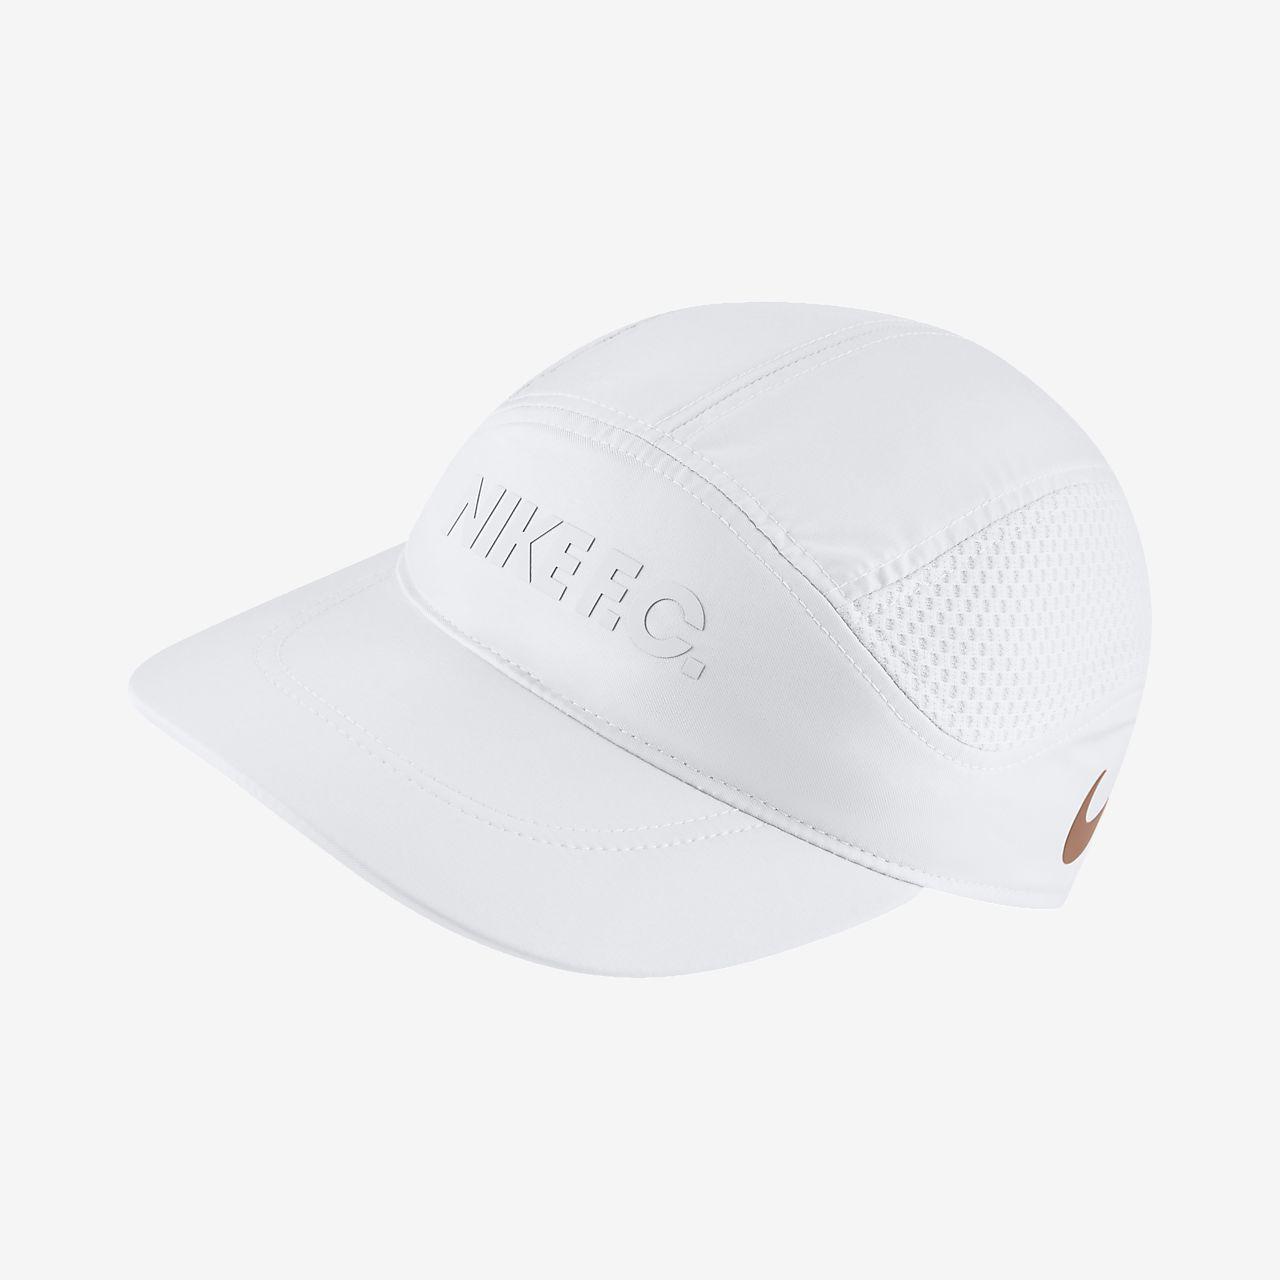 Nike F.C. AeroBill Tailwind verstellbare Fußball-Cap